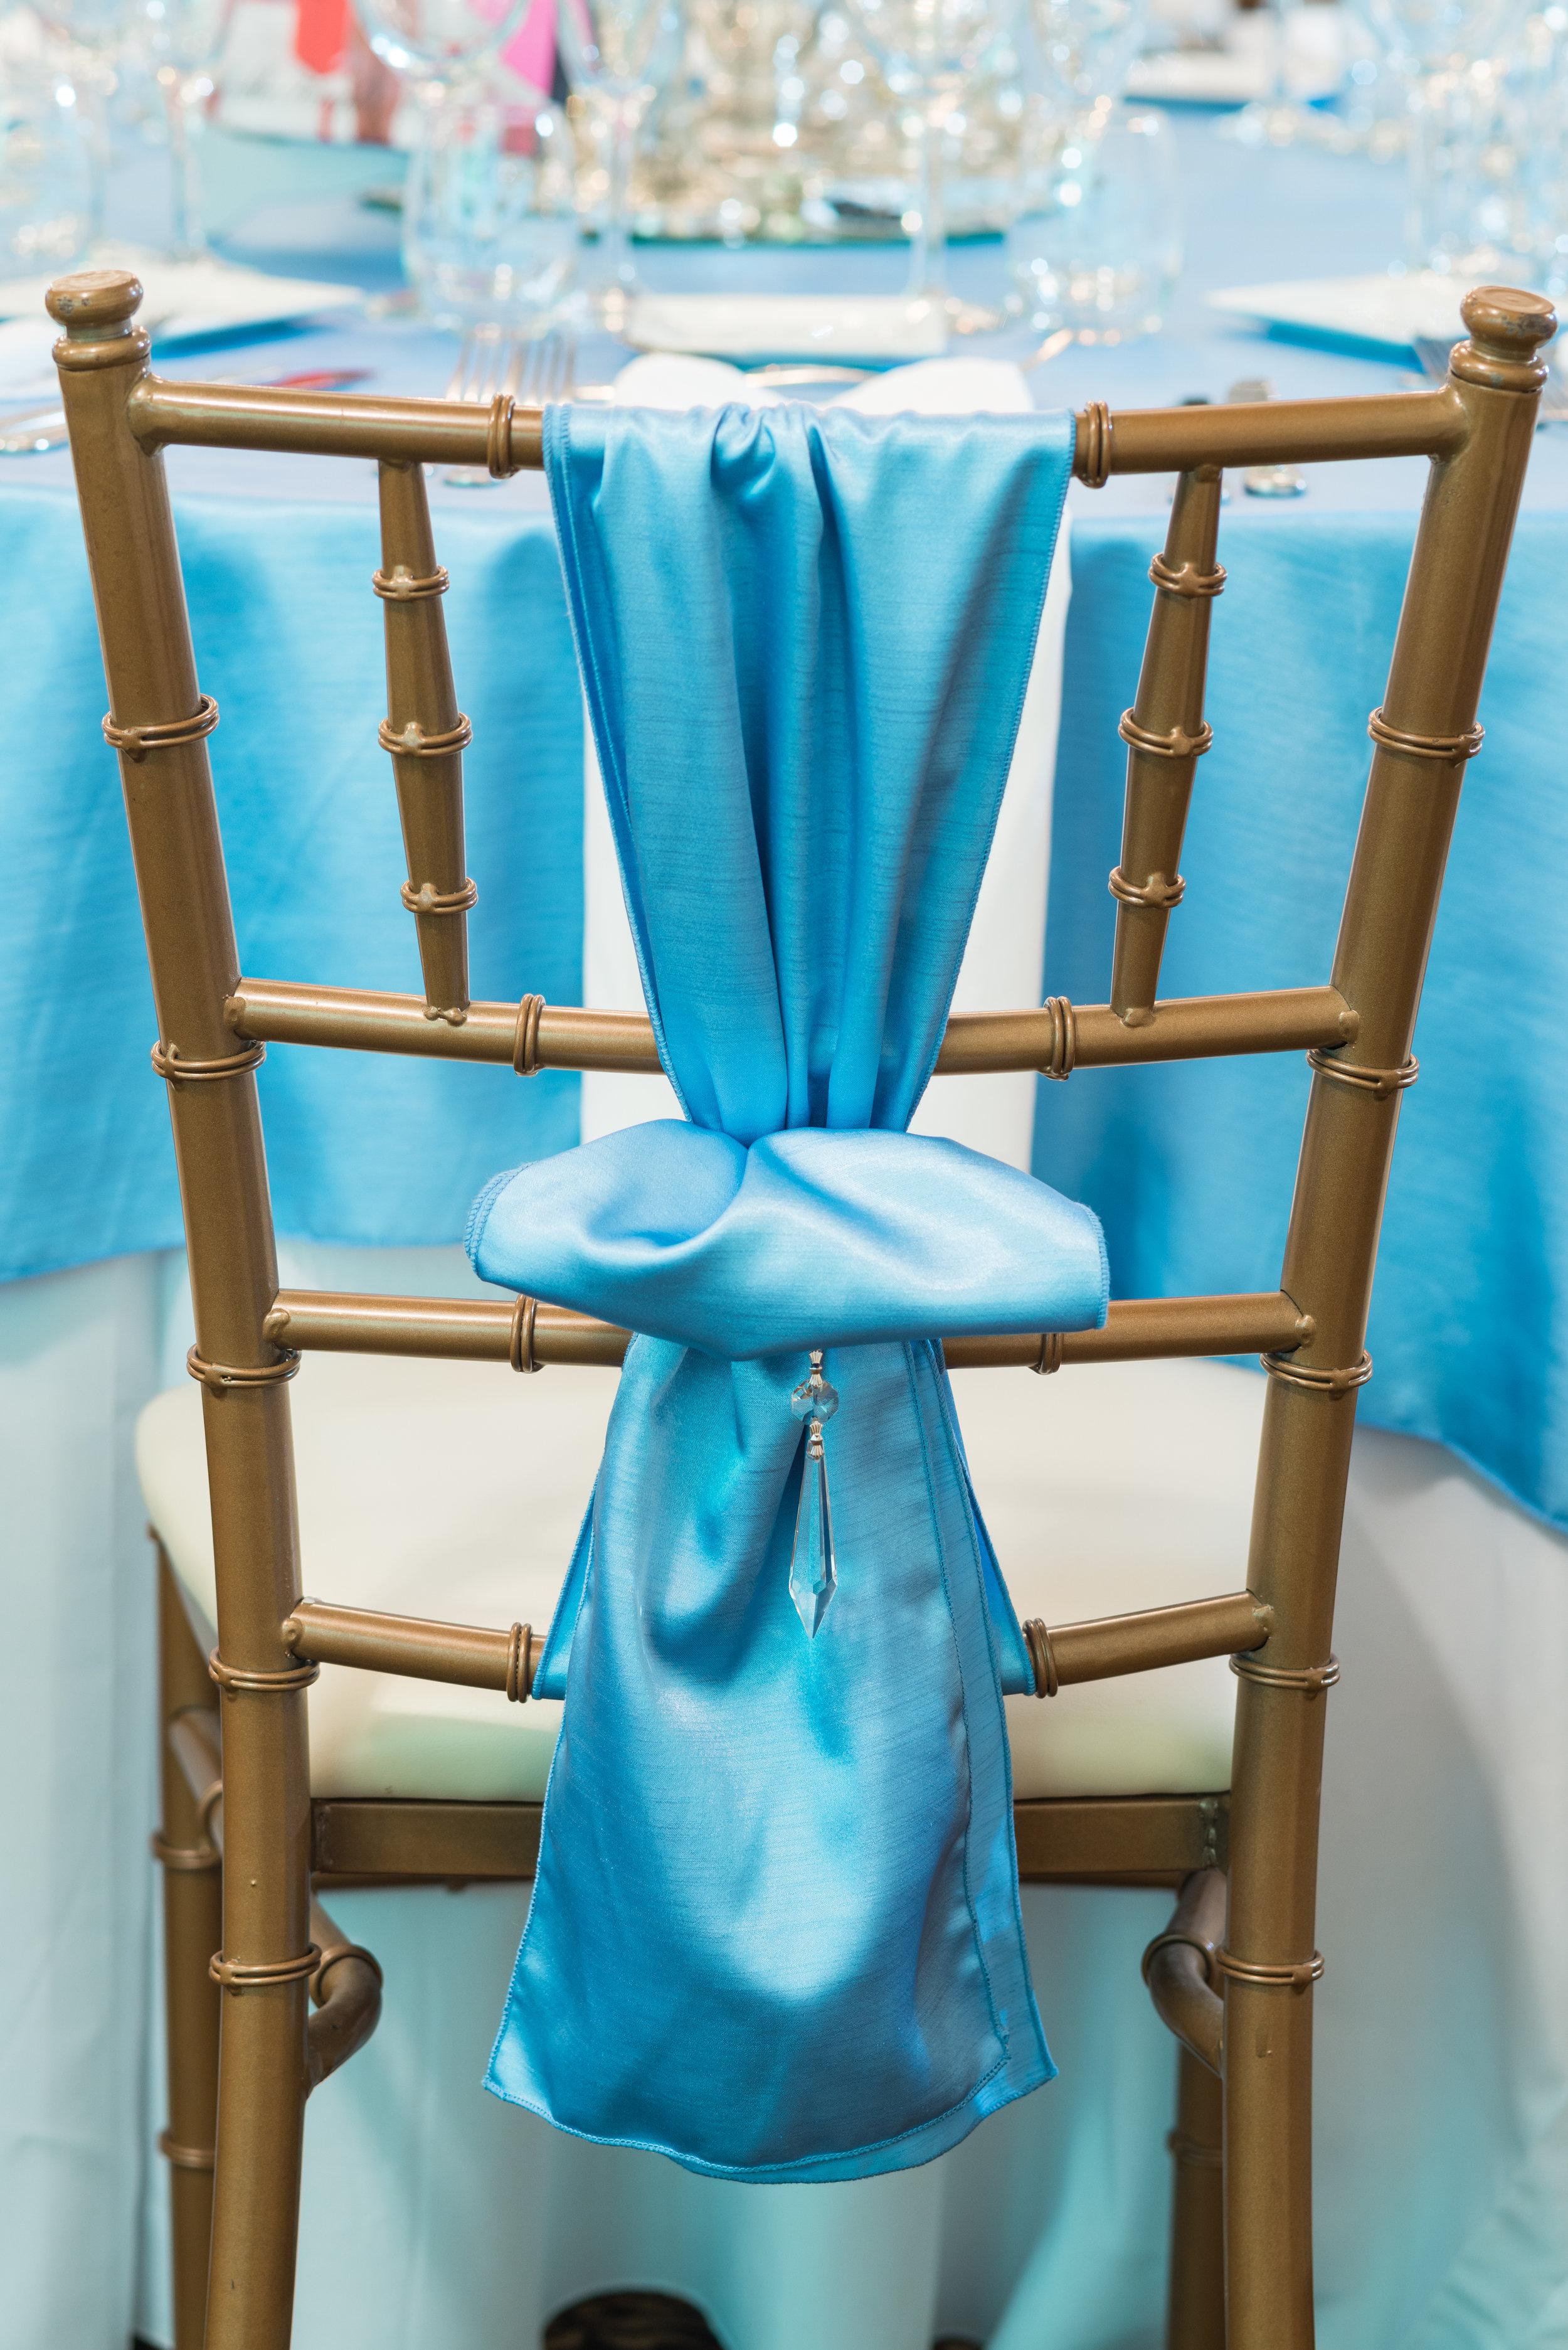 Carl-Kerridge-Photography-North-Beach-Wedding-May-2015-002.jpg